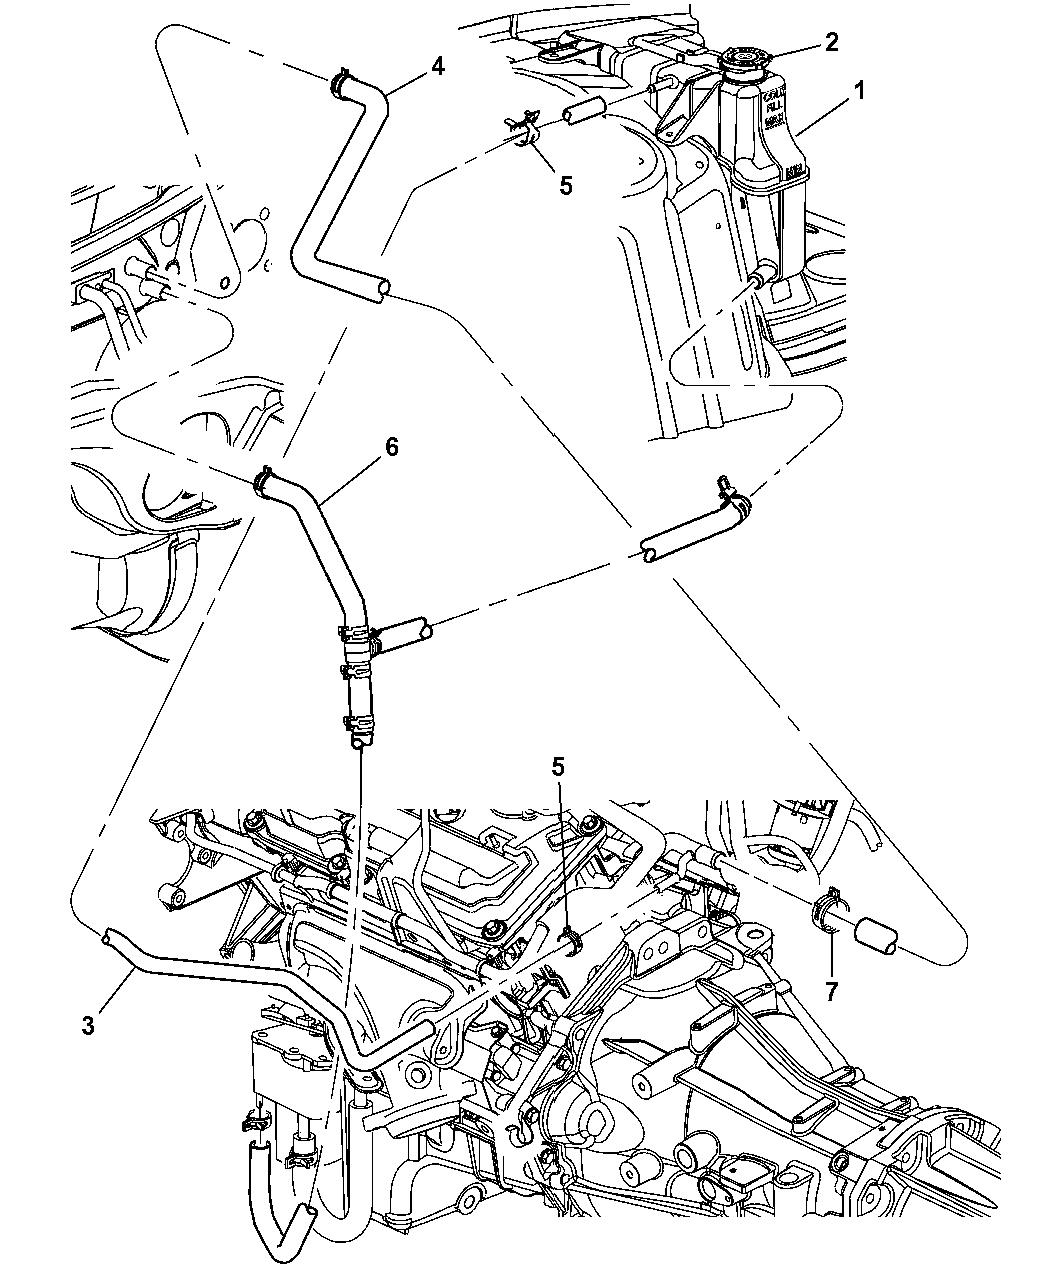 2007 Dodge Magnum Engine Coolant Diagram Wiring Diagram Octavia A Octavia A Musikami It